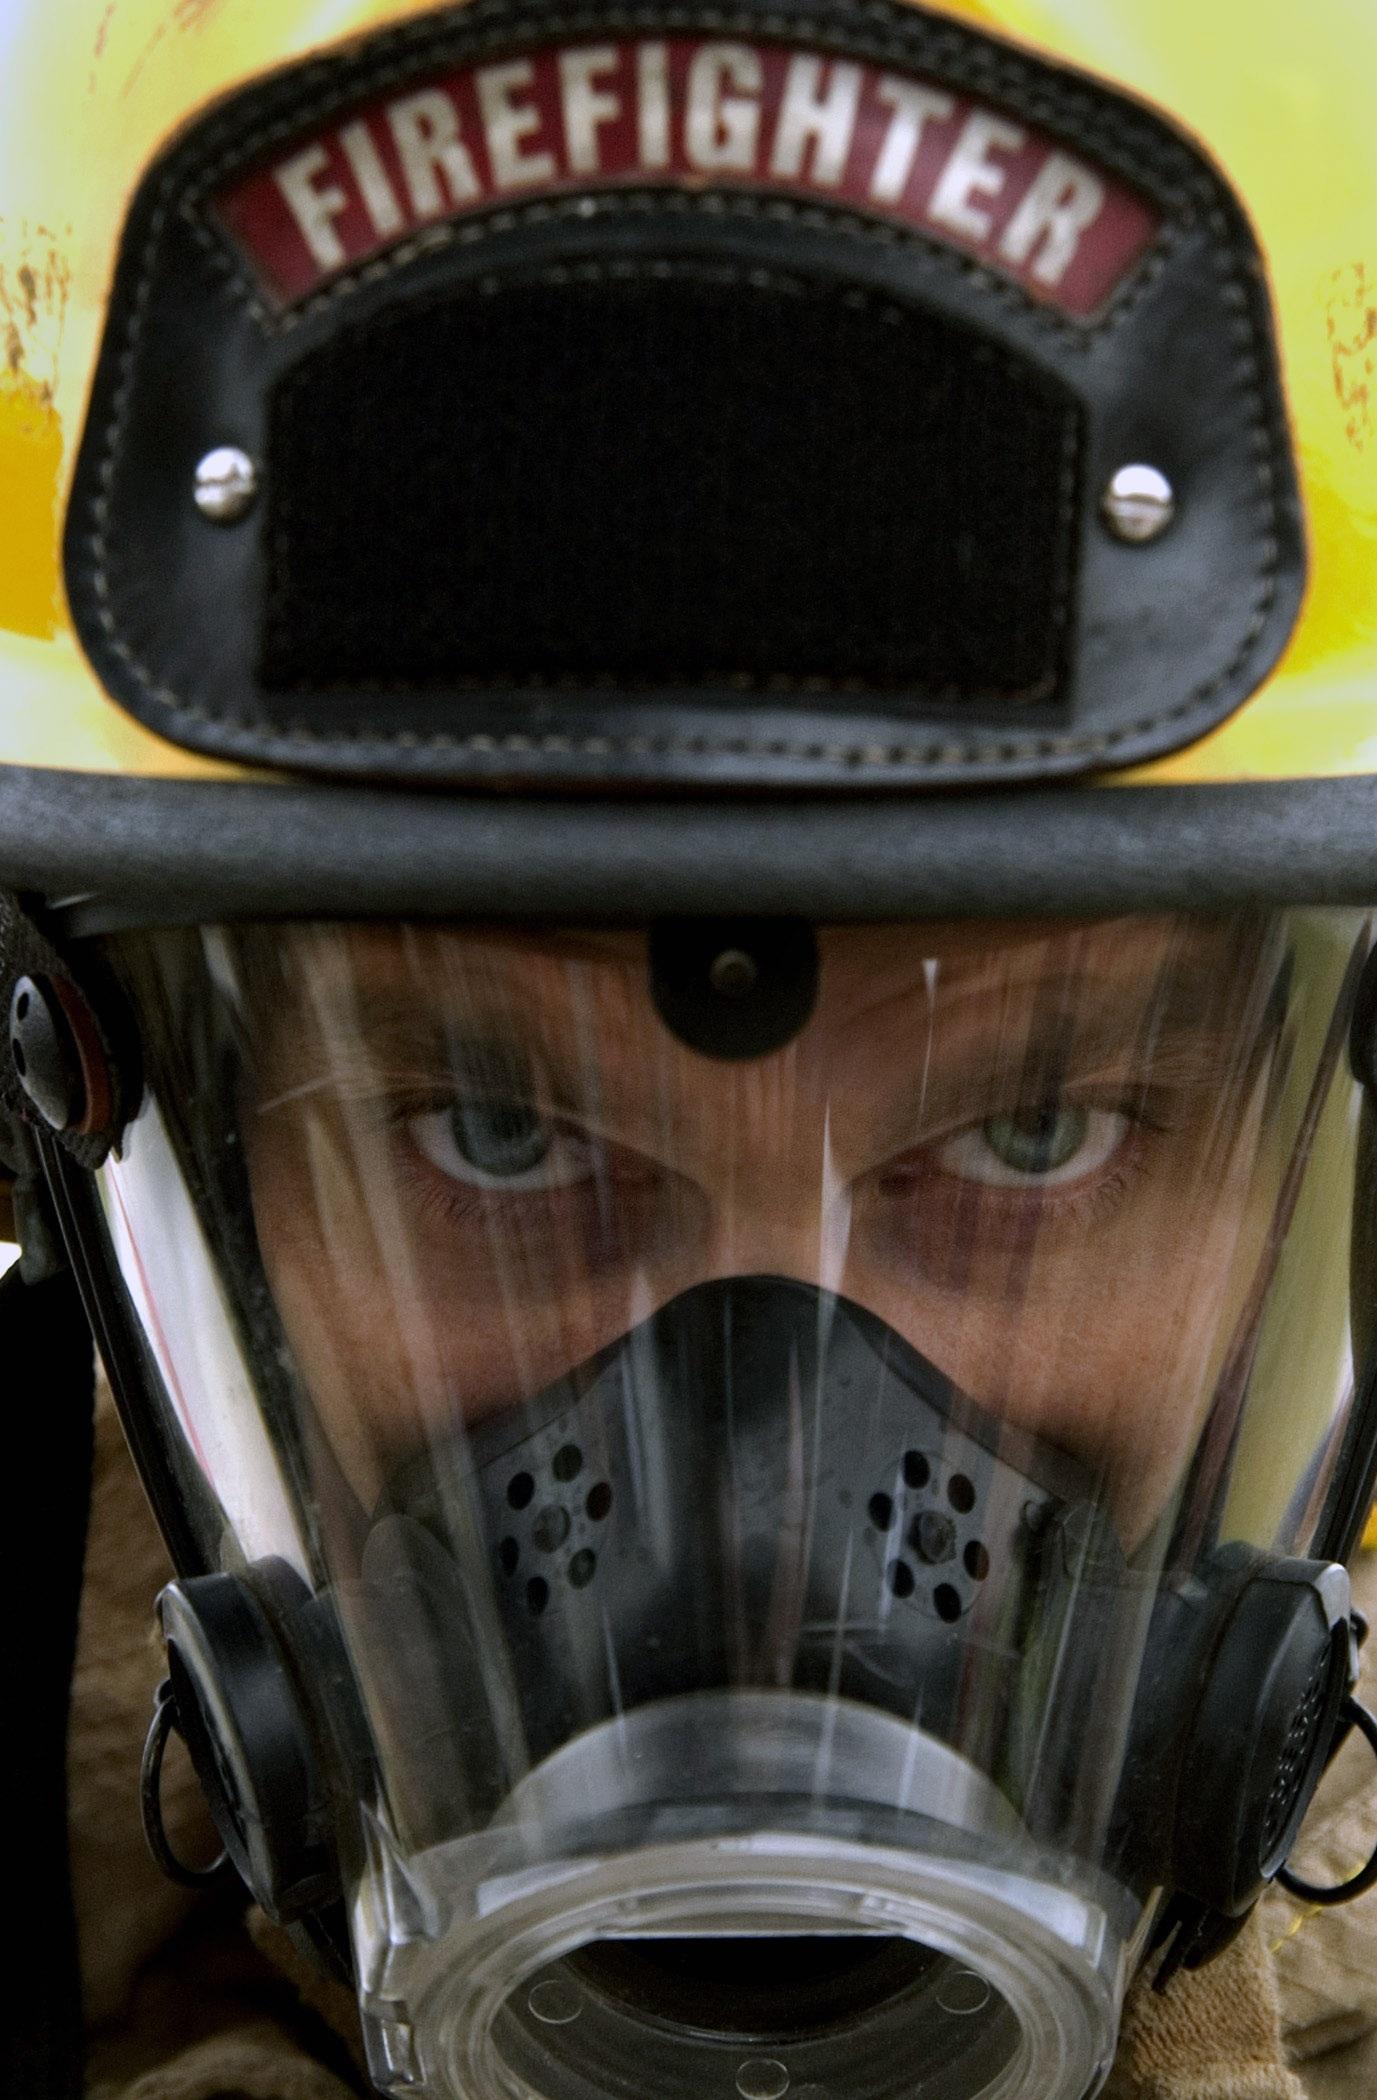 Firemen Training, Activity, Firefighter, Firemen, Human, HQ Photo